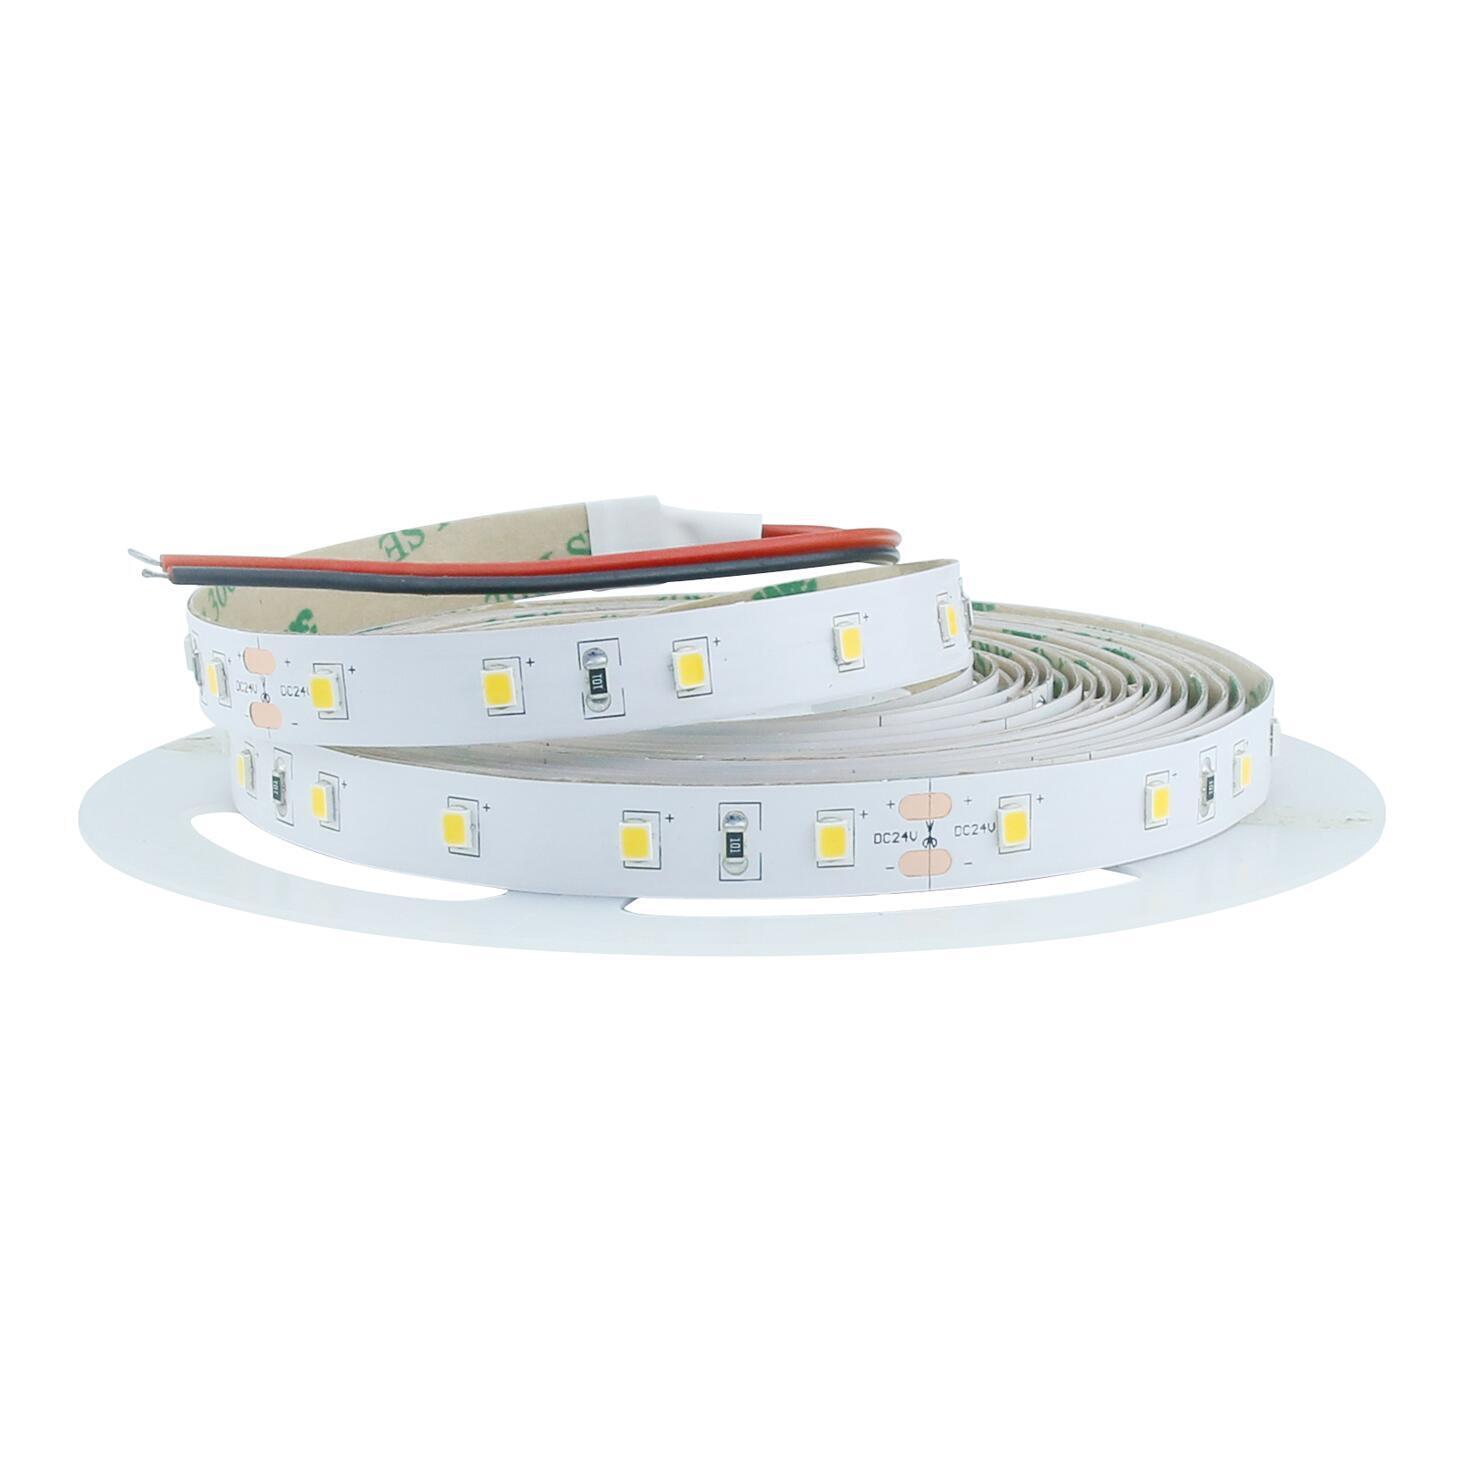 Striscia led Stripled20 5m luce bianco naturale 1050LM IP20 - 2